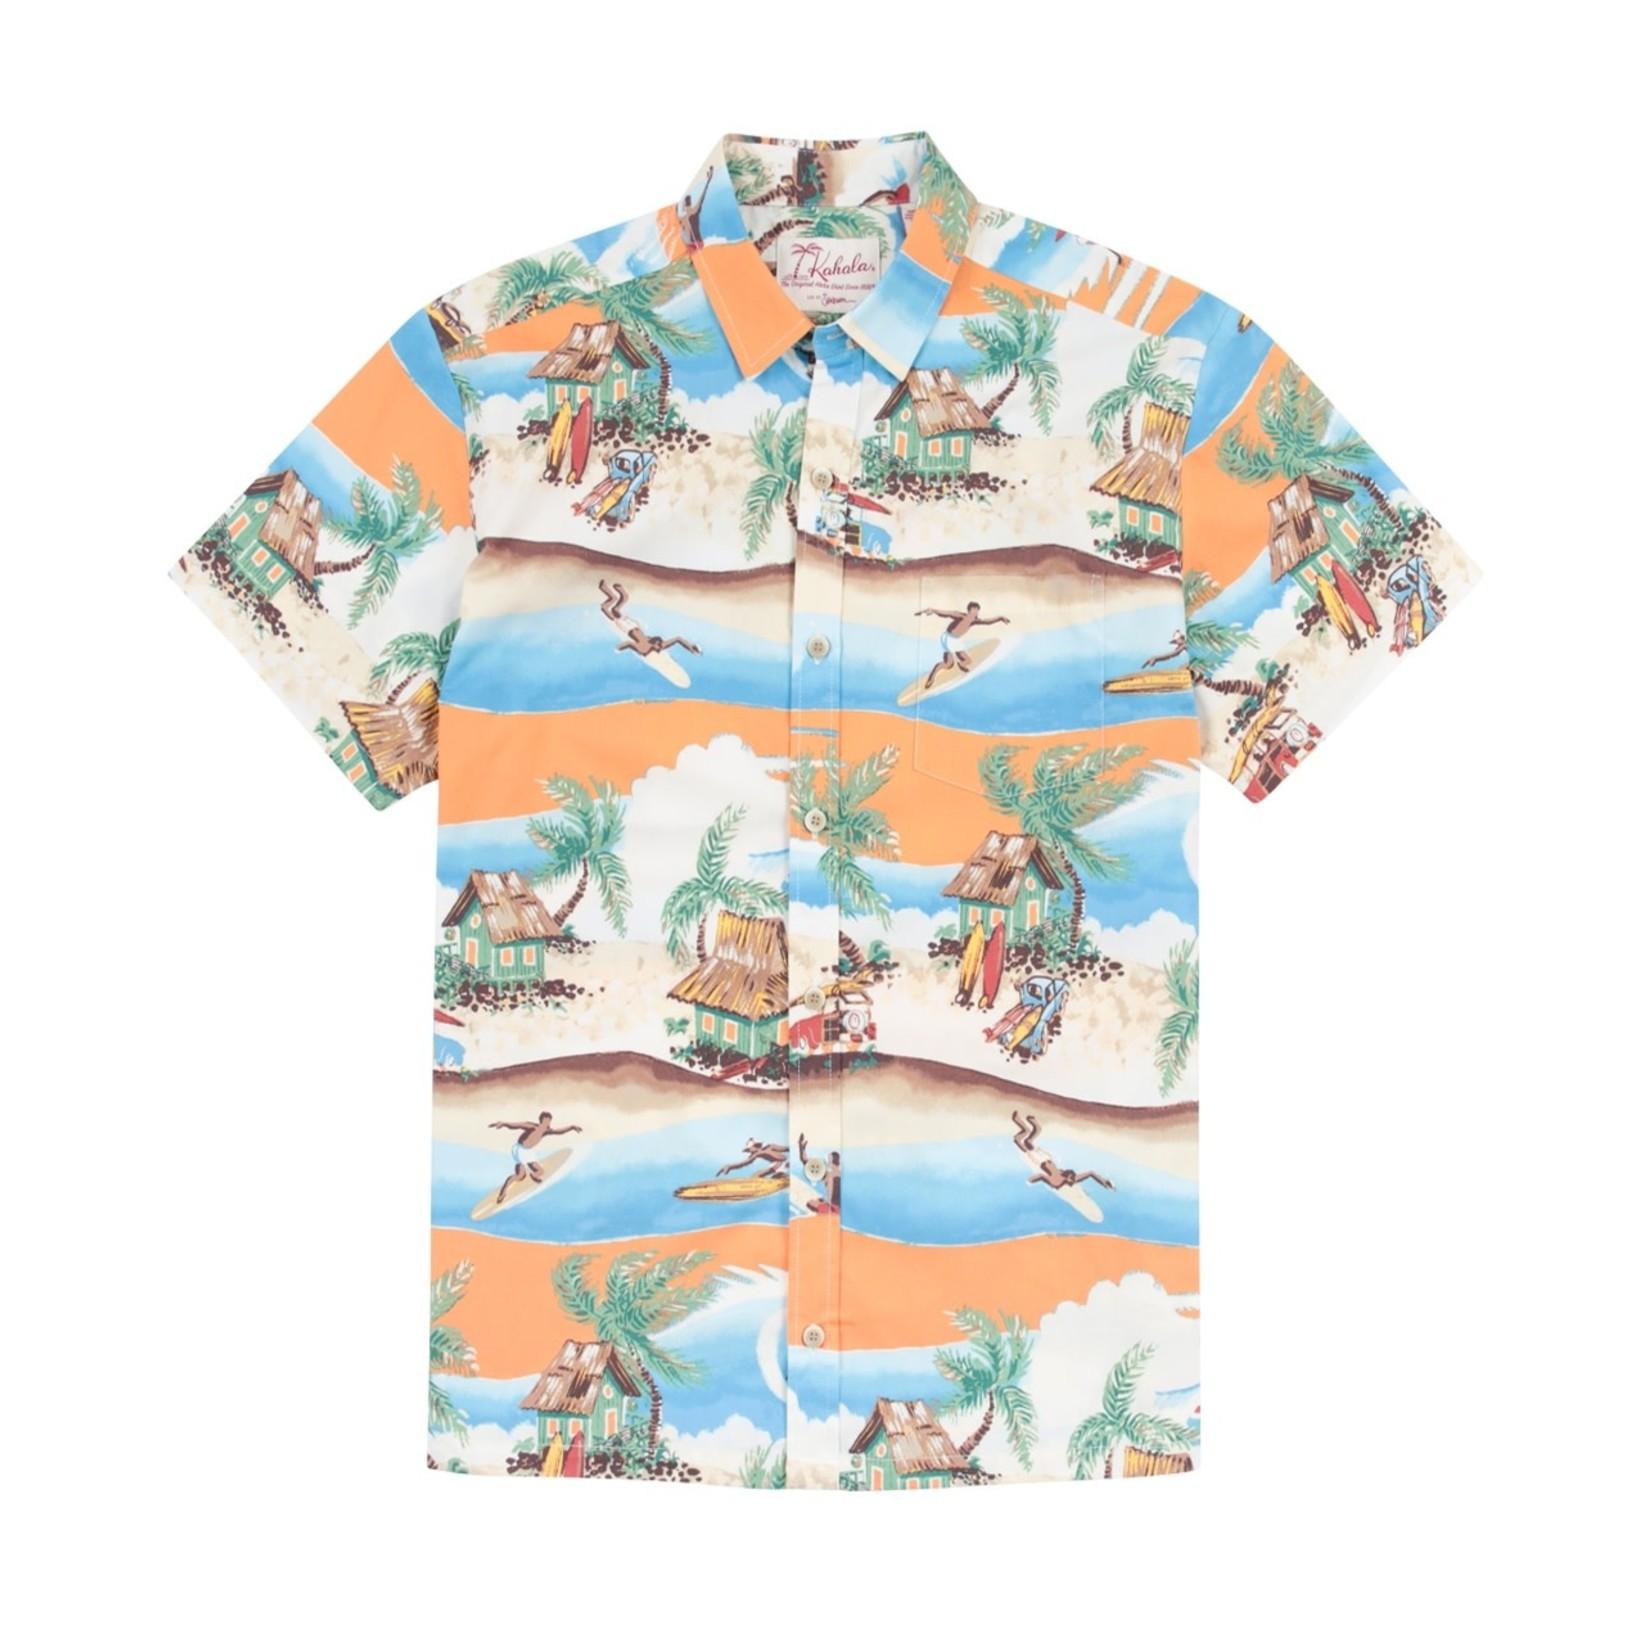 Kahala Kahala Aloha Shirt Cool Swell